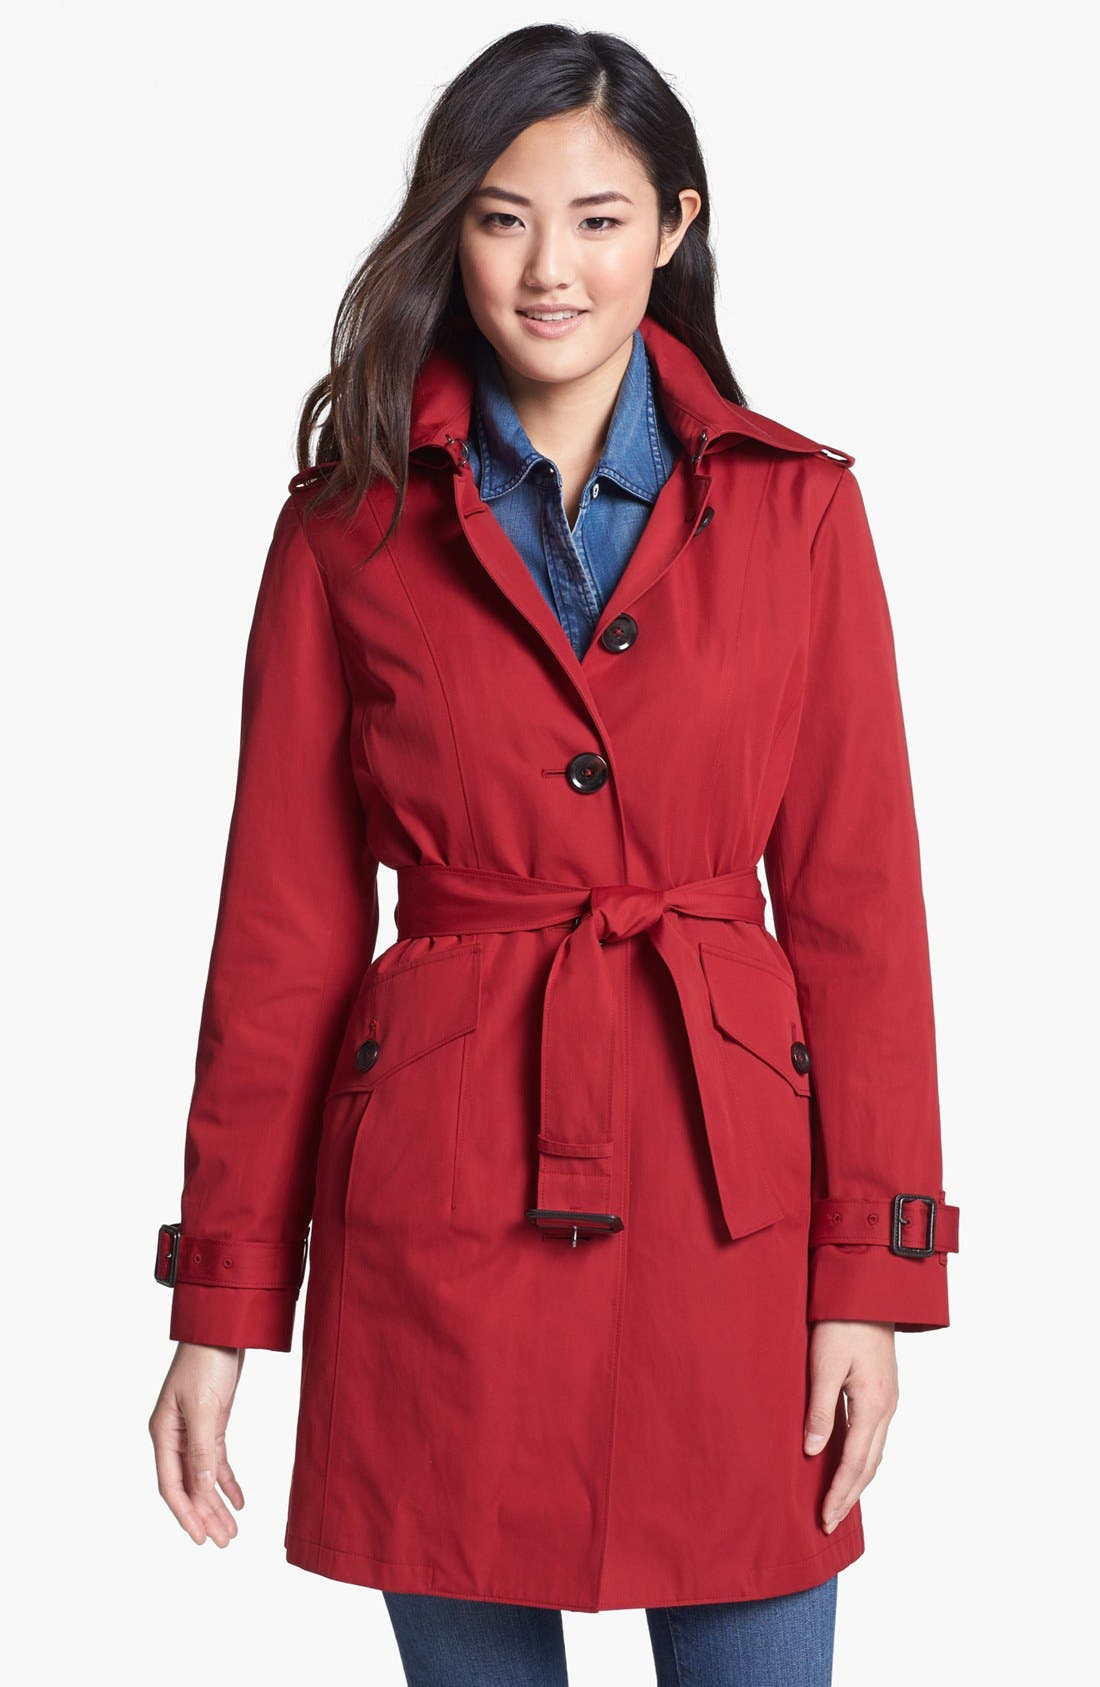 Main Image - MICHAEL Michael Kors Trench Coat with Detachable Hood (Regular & Petite) (Nordstrom Exclusive)